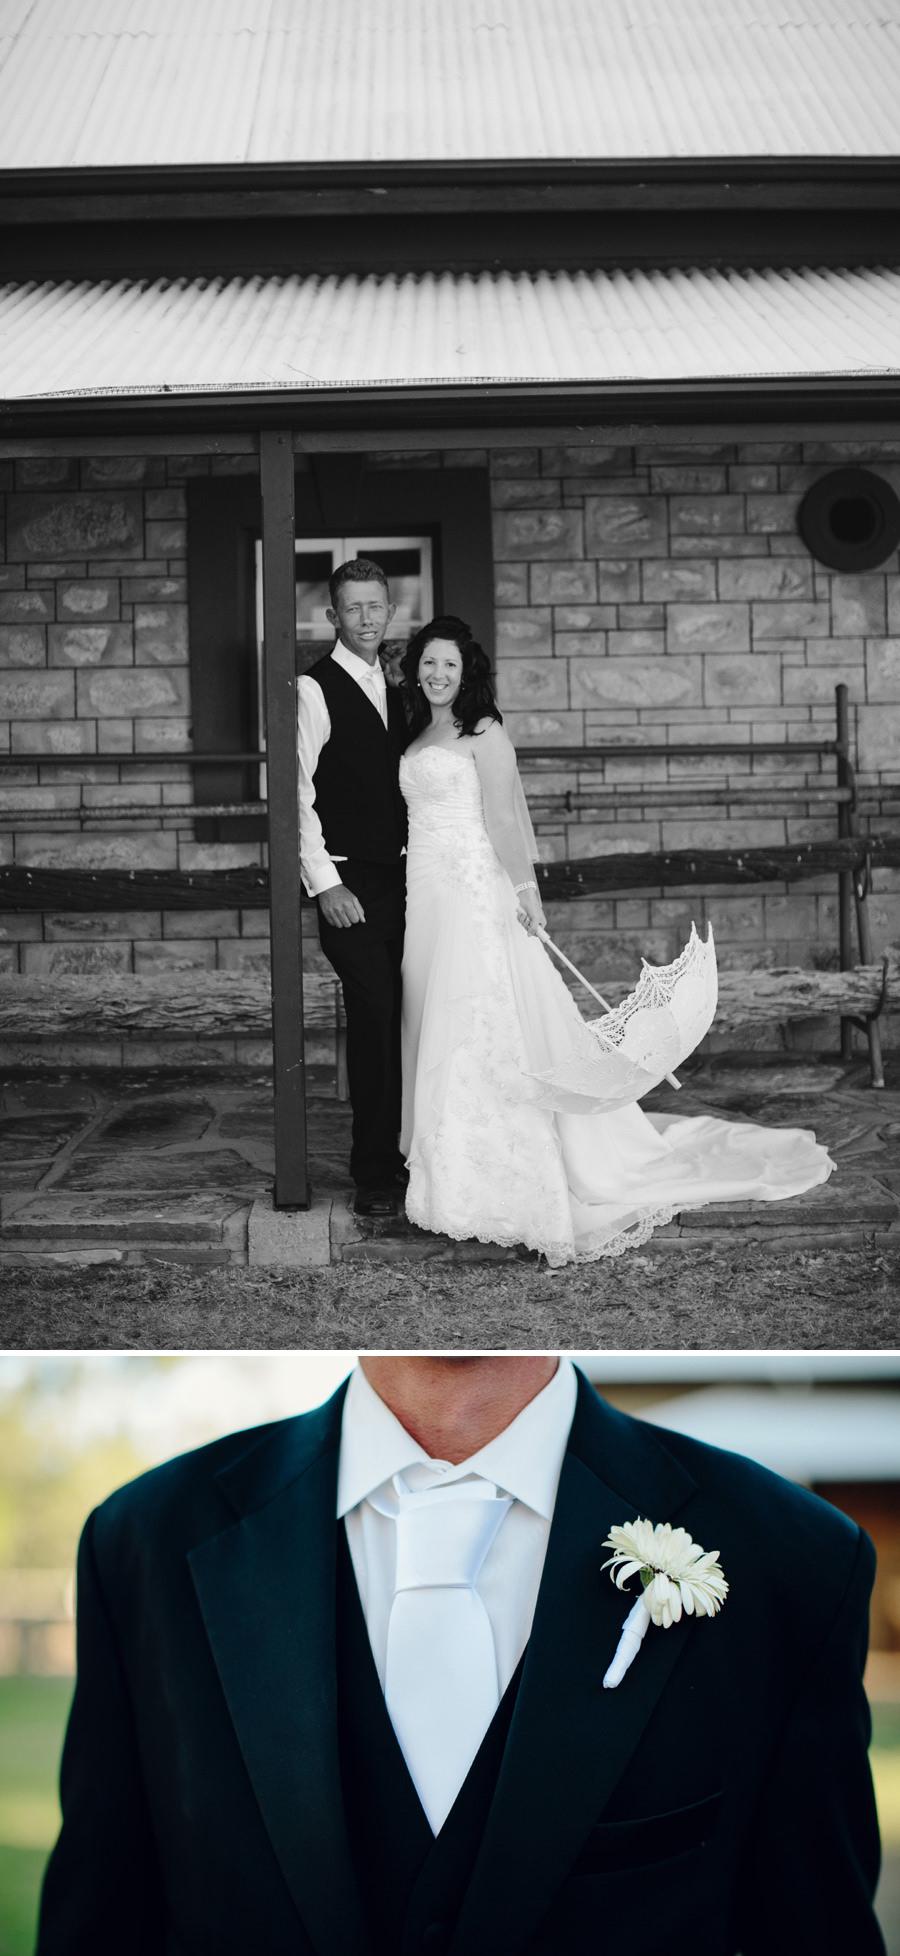 Telegraph Station Wedding Photographers: Bride & groom